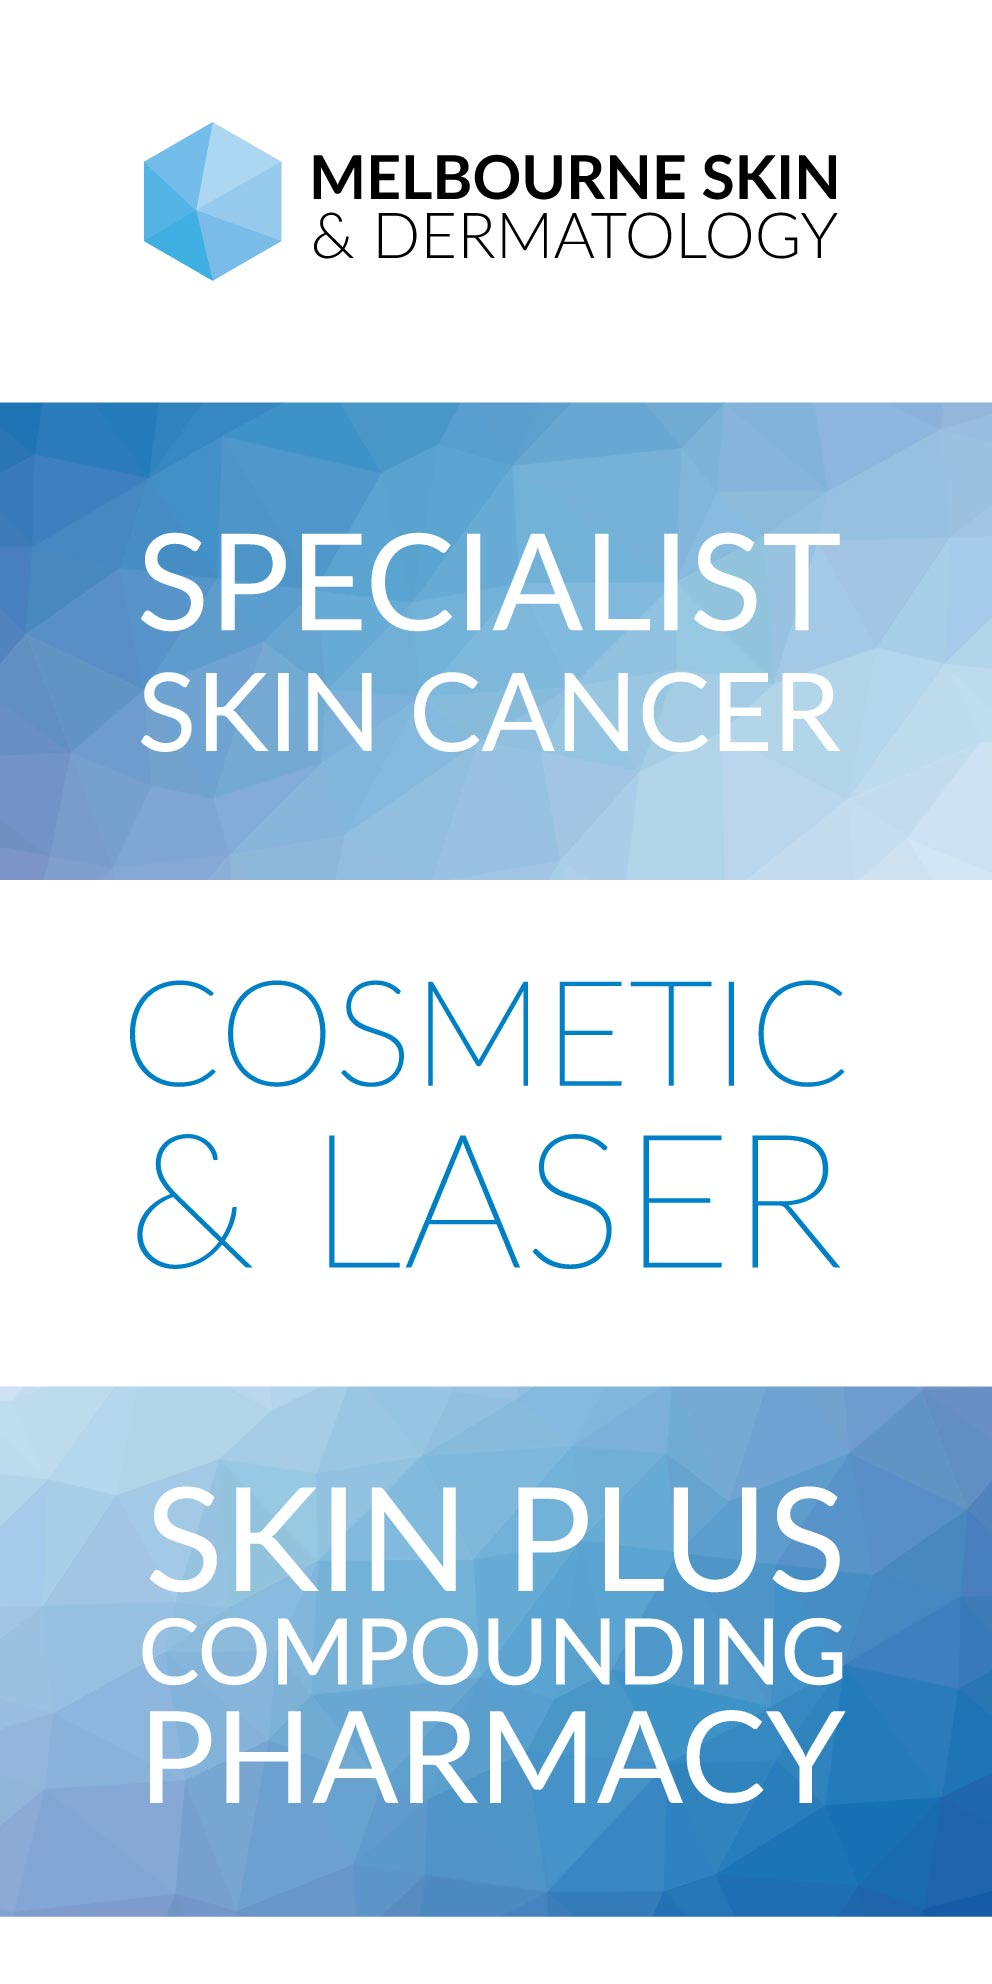 Стенд KNOX Melbourne Skin & Dermatology